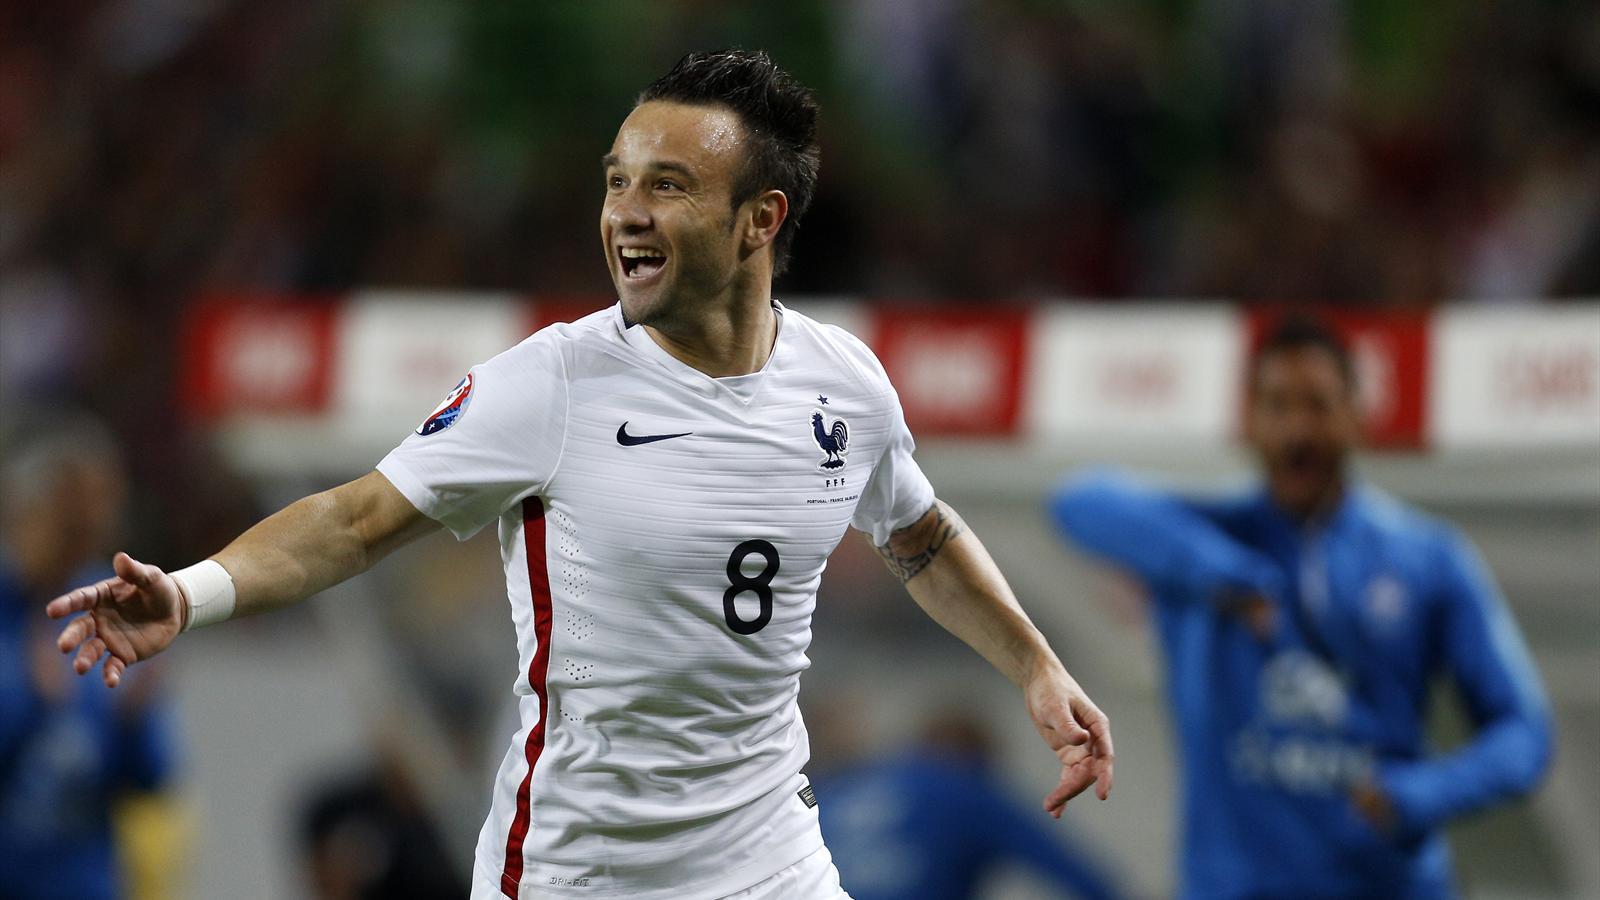 Mathieu Valbuena nets free kick but Nabil Fekir injured as France